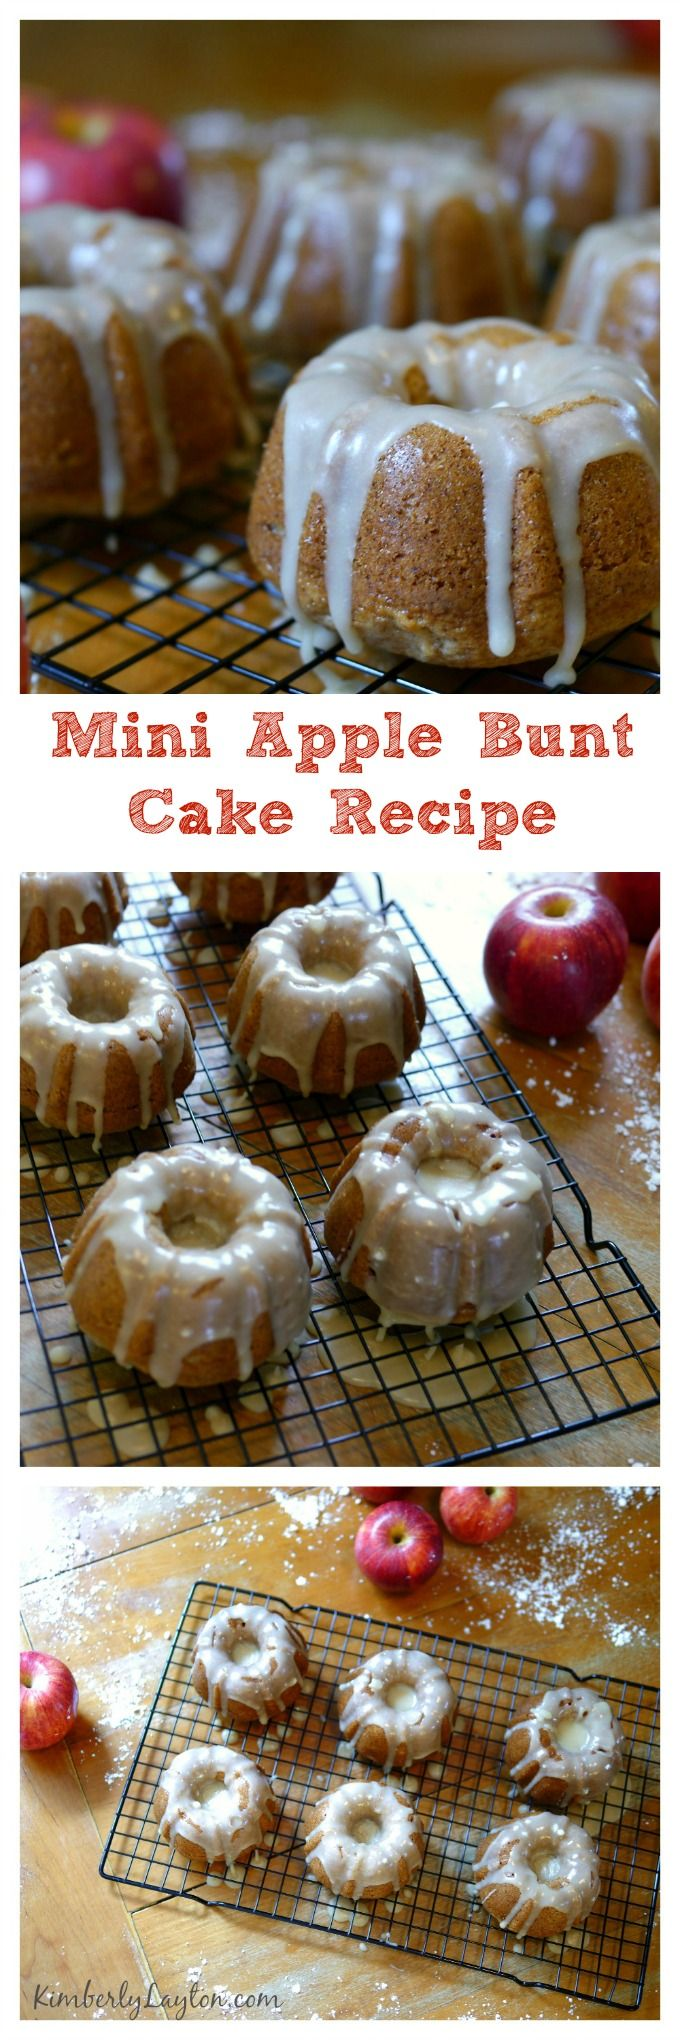 Mini Apple Bundt Cake Recipe On Kimberlylayton Com Cakes